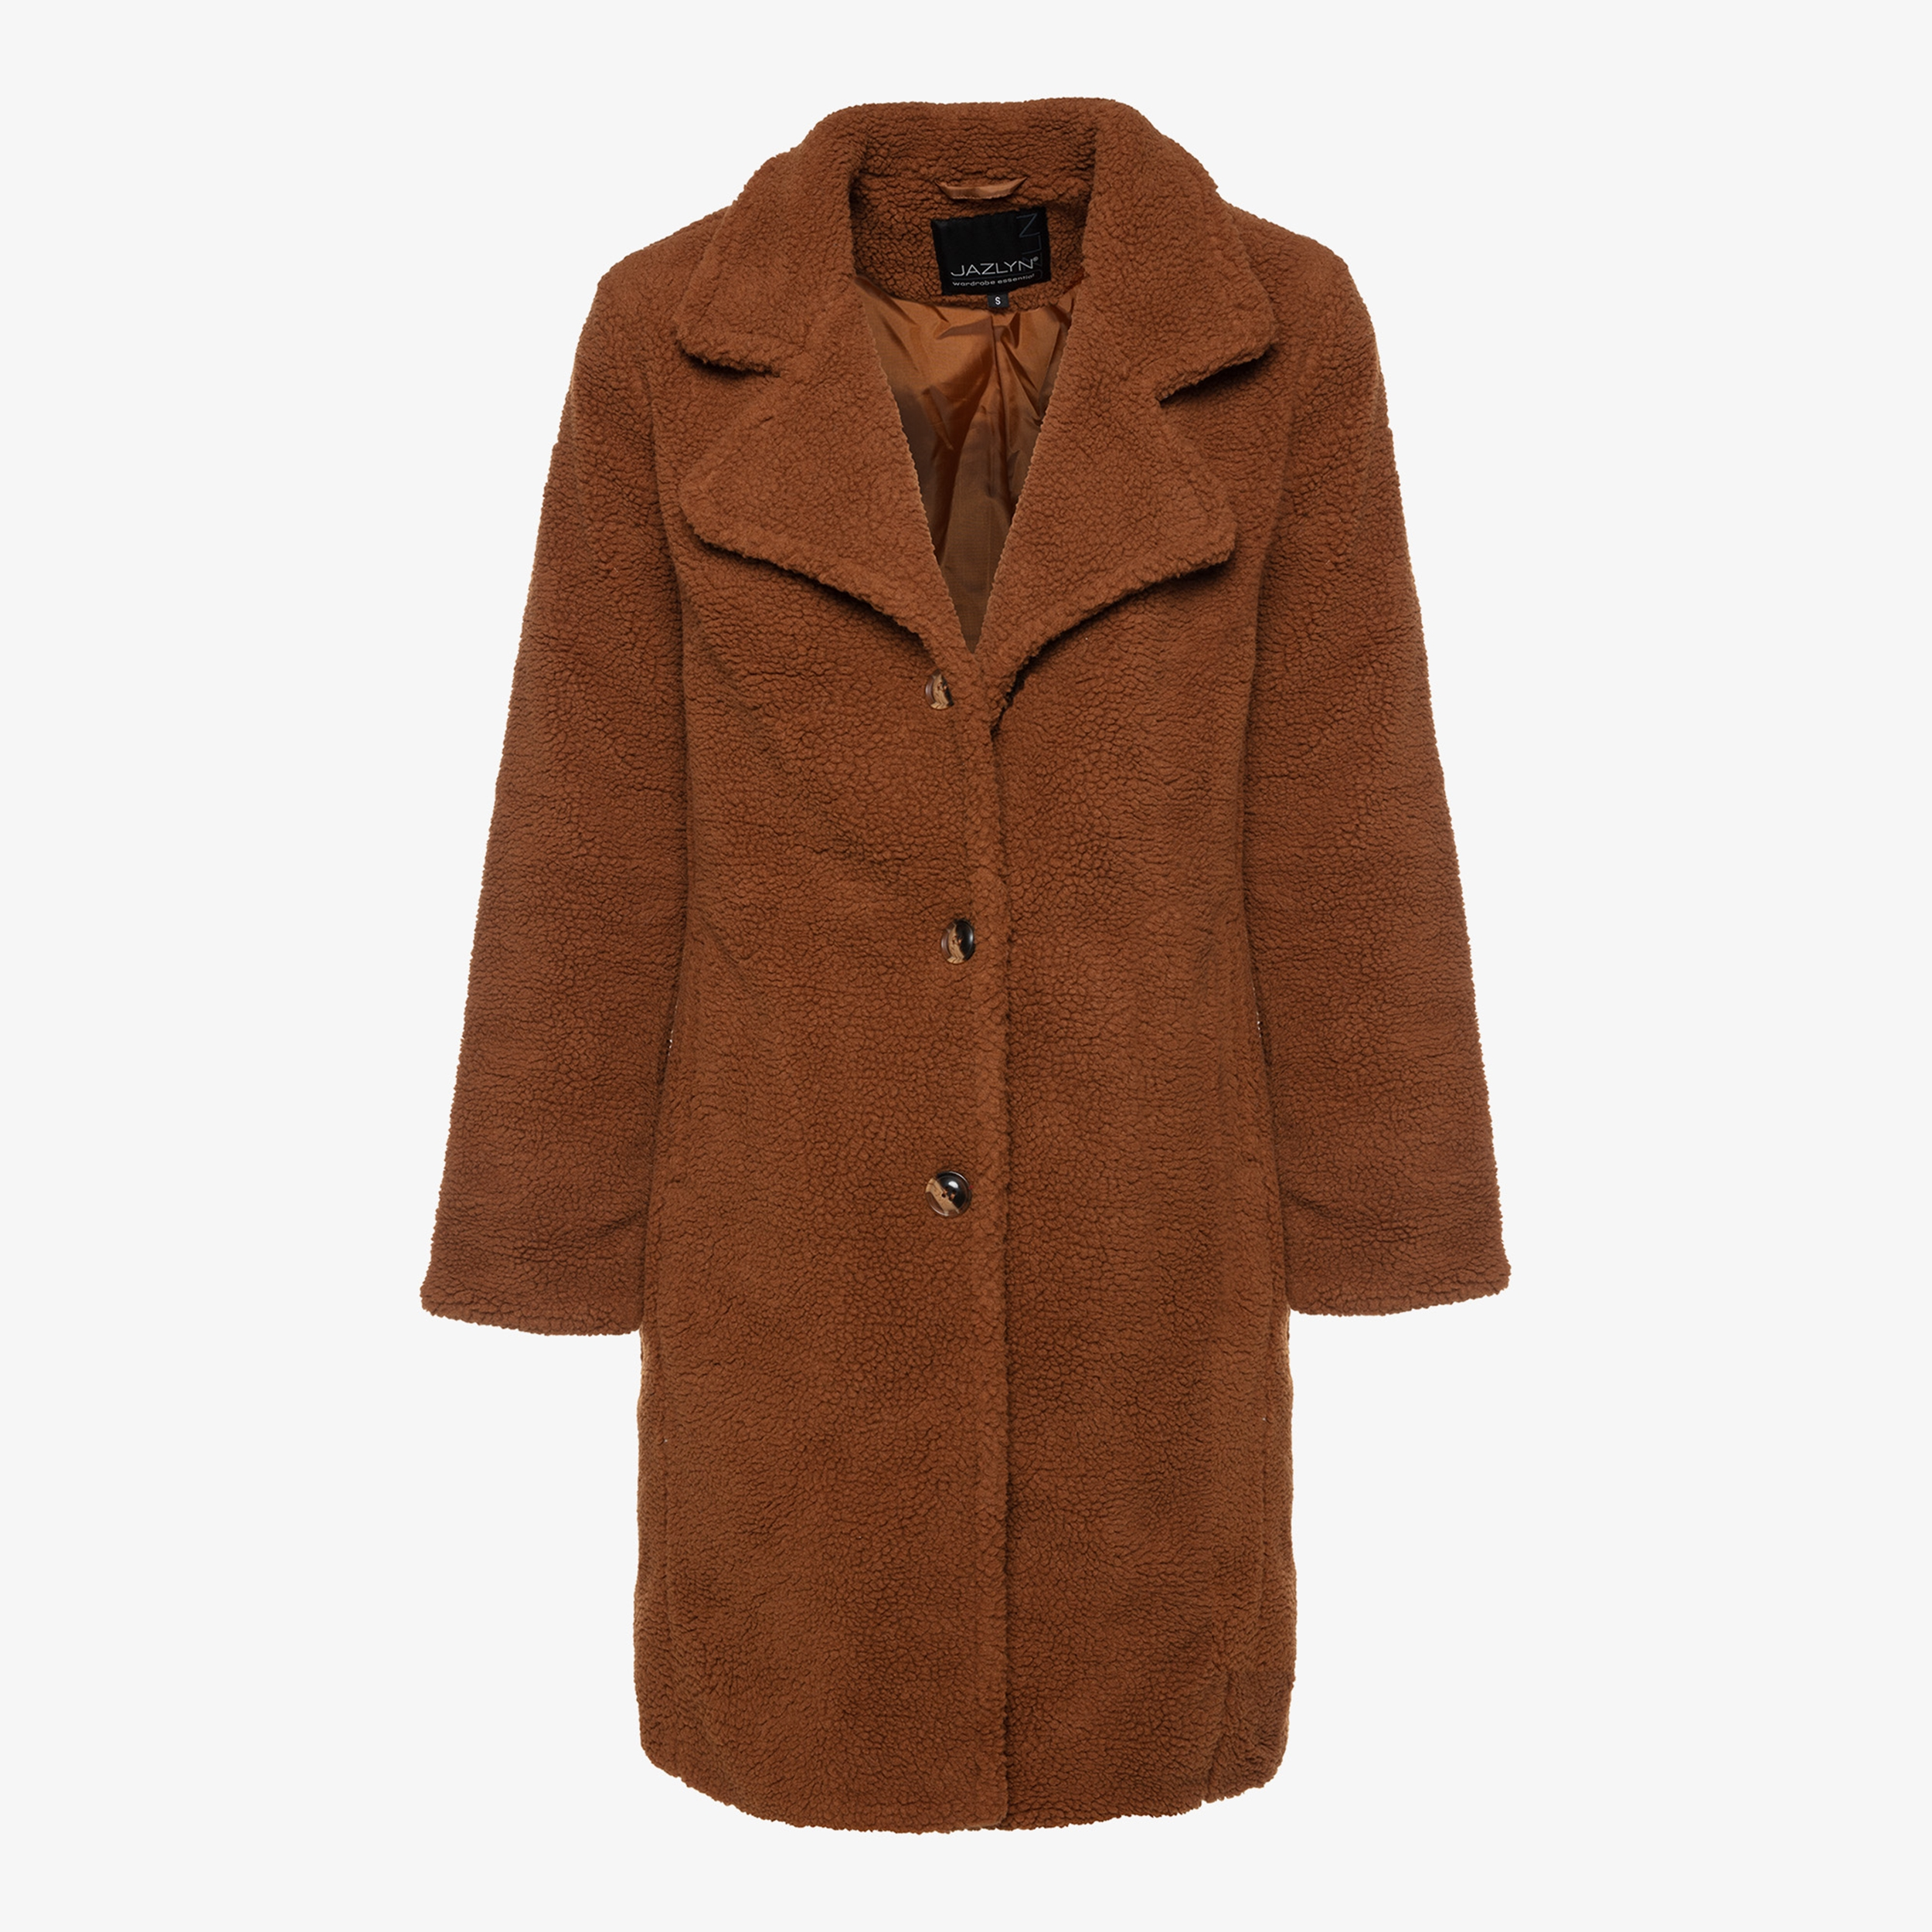 Jazlyn dames teddy coat